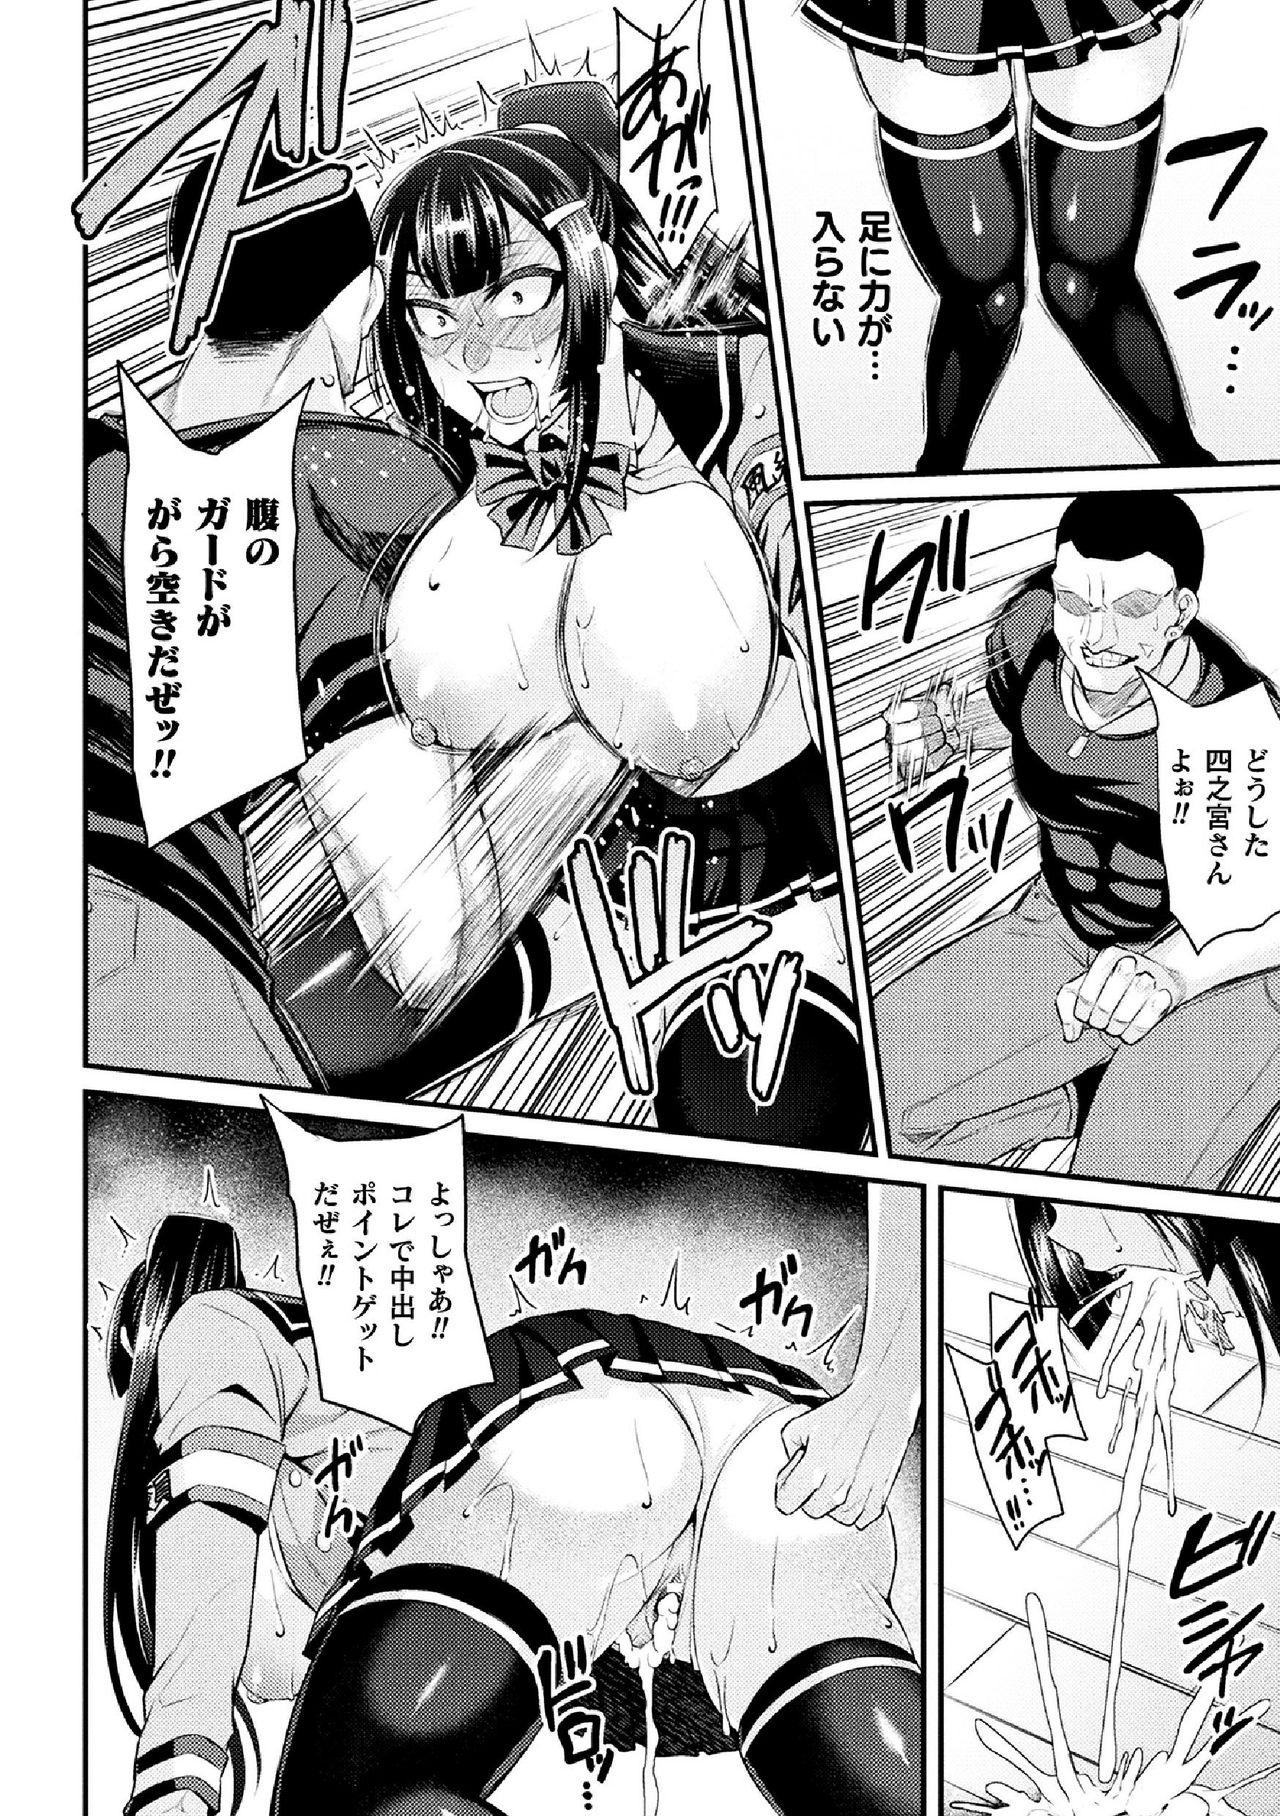 2D Comic Magazine Namaiki Onna ni HaraPun Seisai! Vol. 2 15